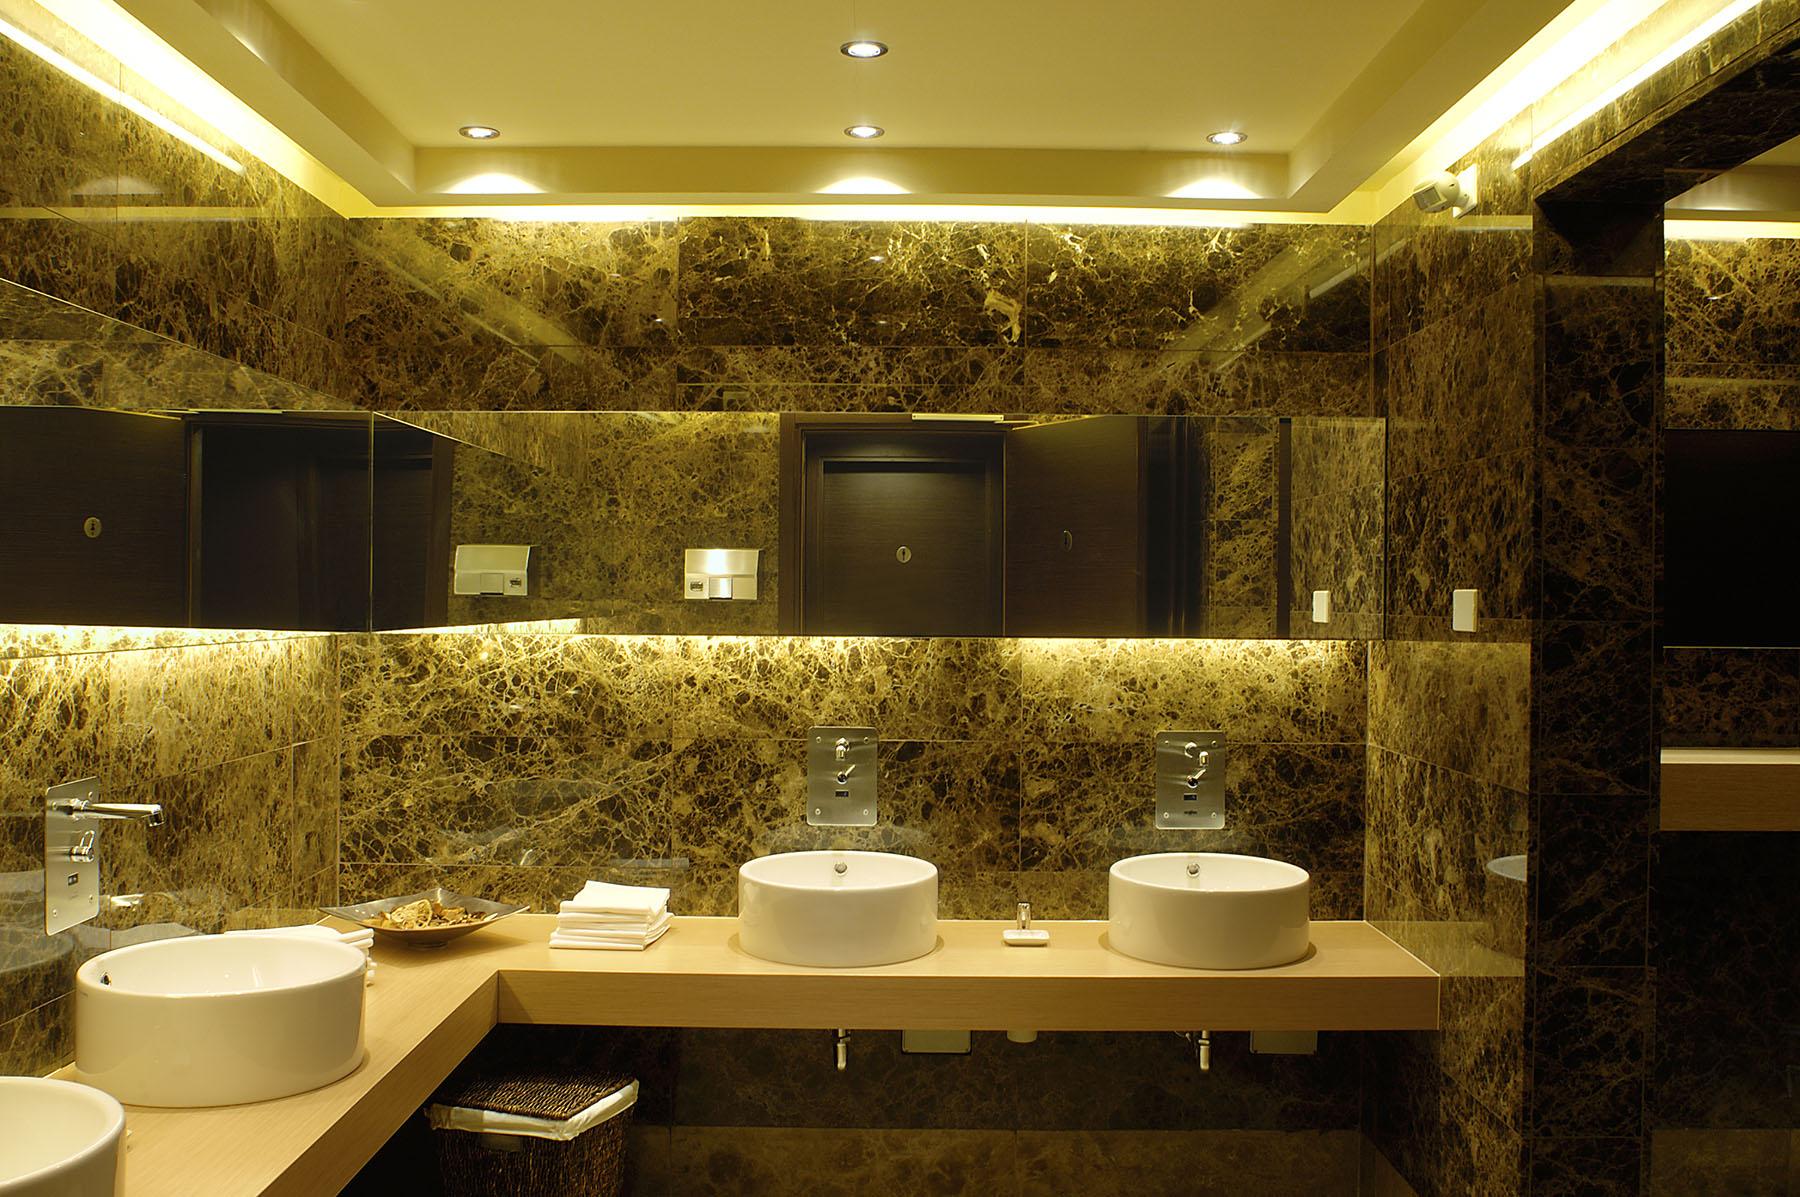 1_Hotel Litta Palace (8)